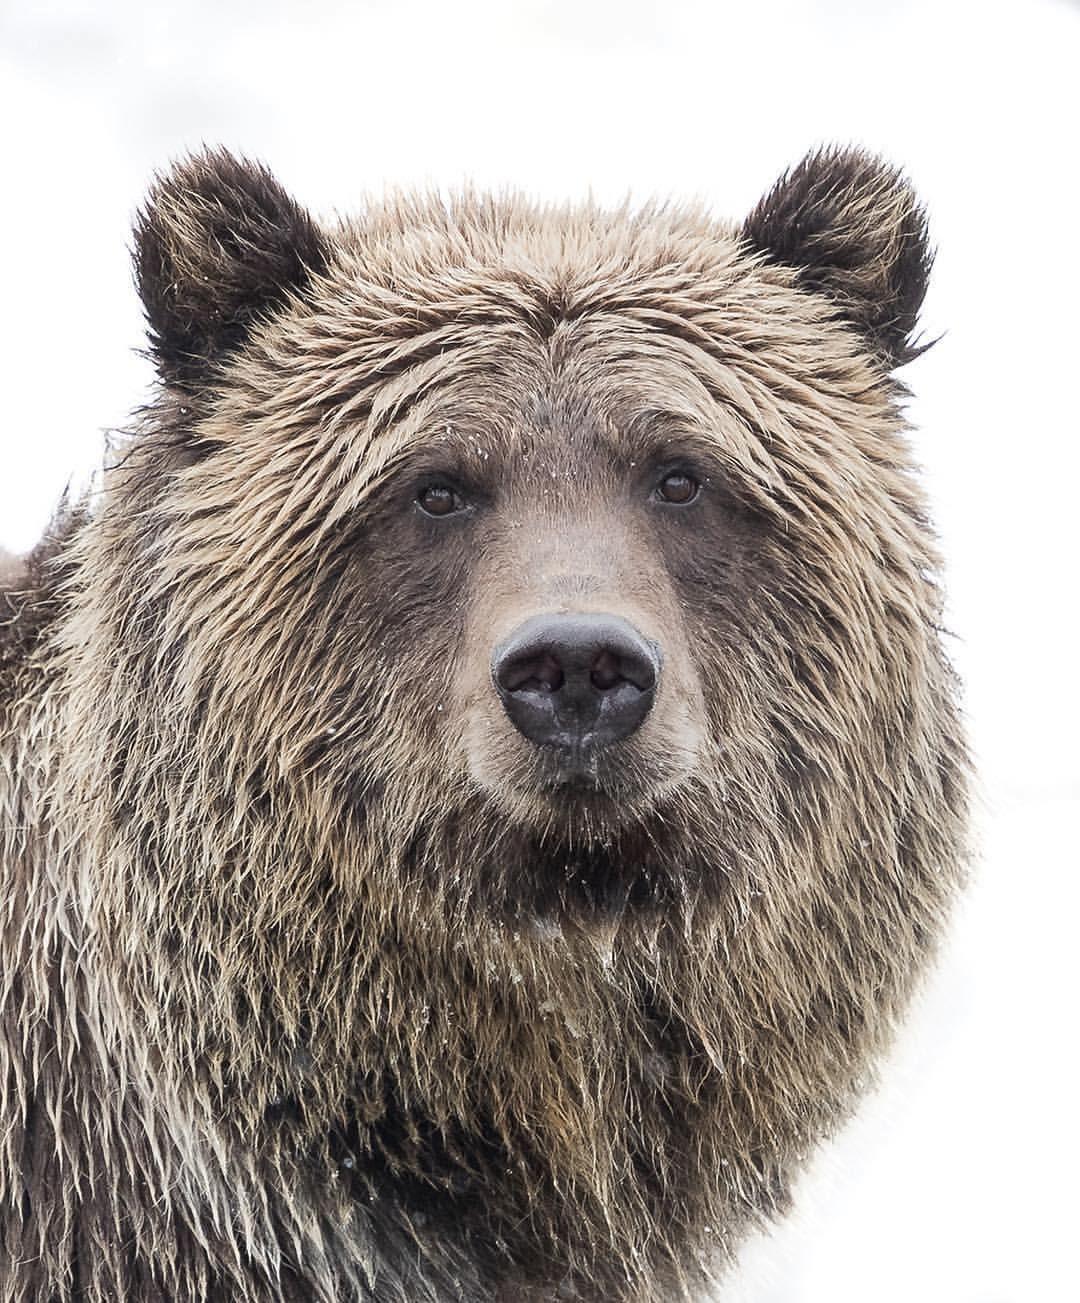 Oso pardo   all about bears   Pinterest   Osos pardos, Osos y Animales